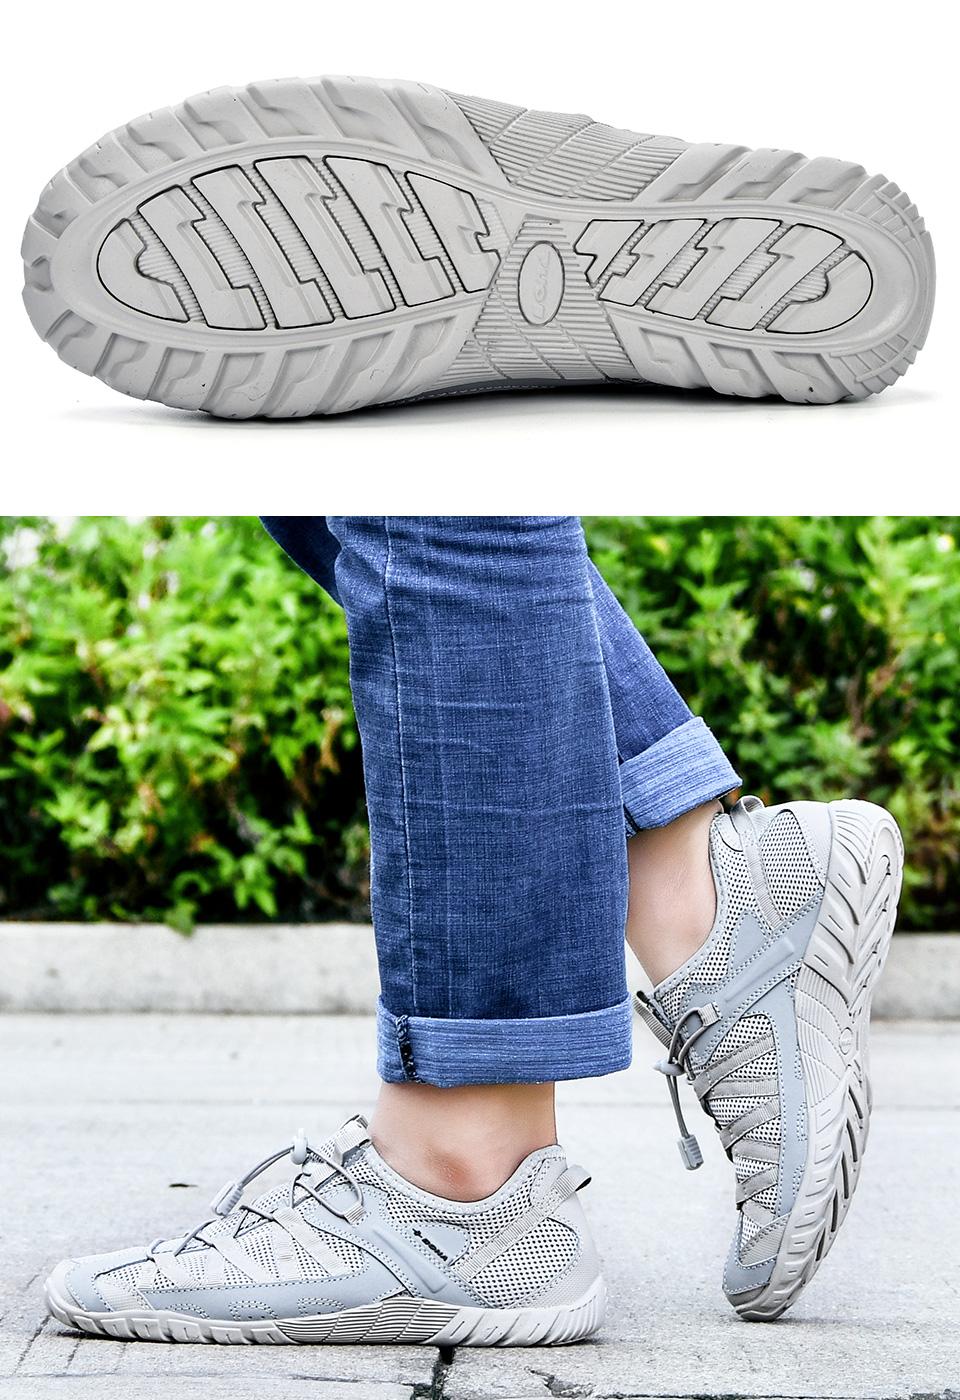 HTB1vvwso8jTBKNjSZFDq6zVgVXaO BONA 2018 Summer Sneakers Breathable Men Casual Shoes Fashion Men Shoes Tenis Masculino Adulto Sapato Masculino Men Leisure Shoe